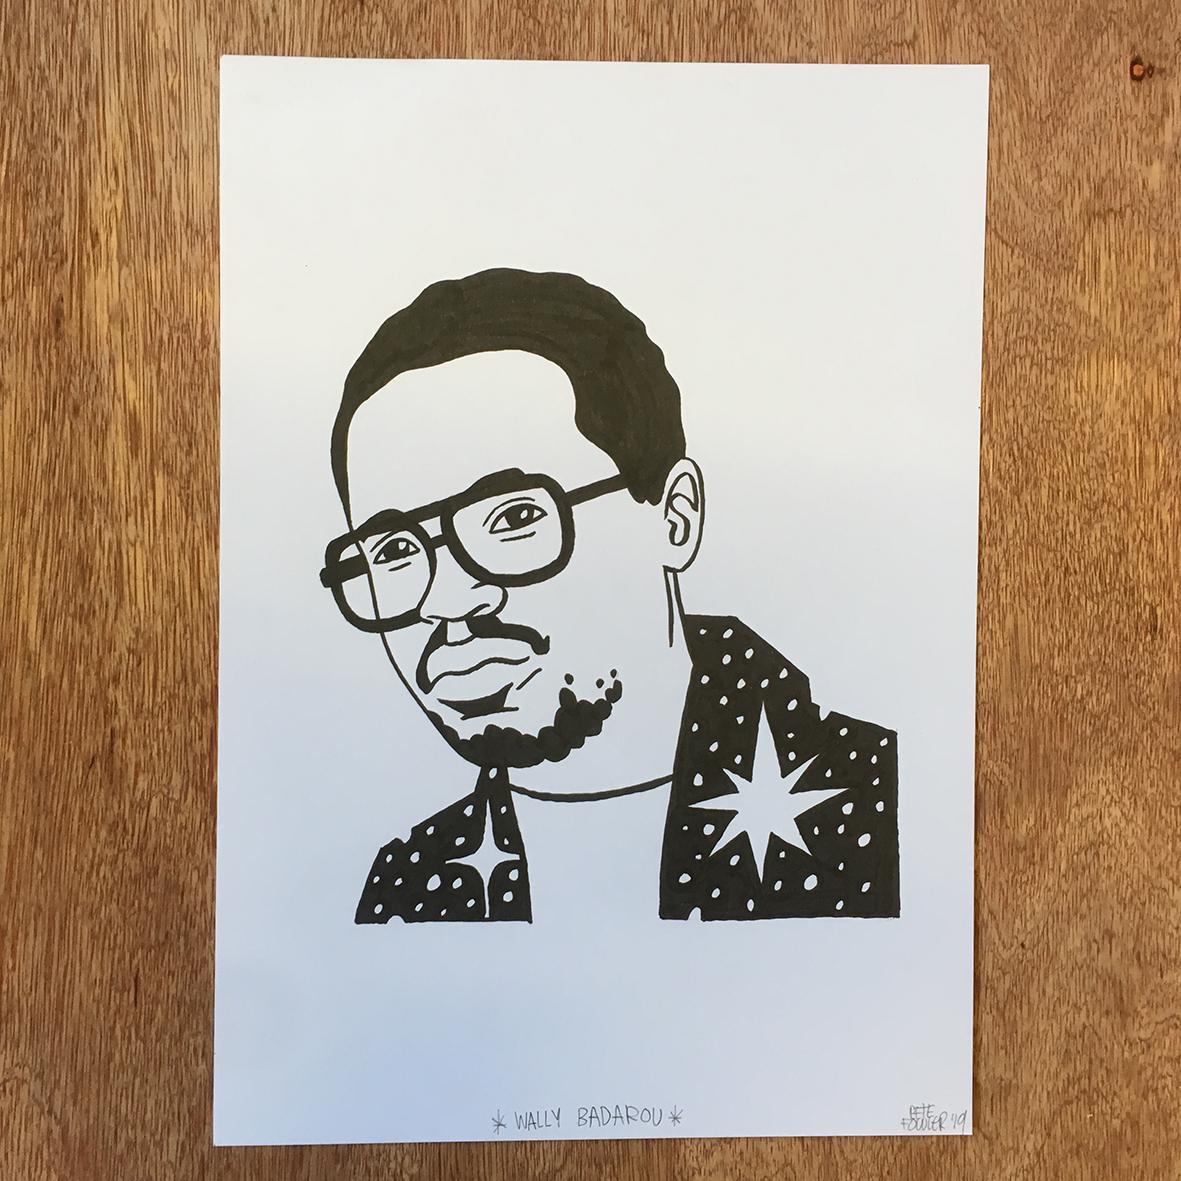 Wally Badarou drawing